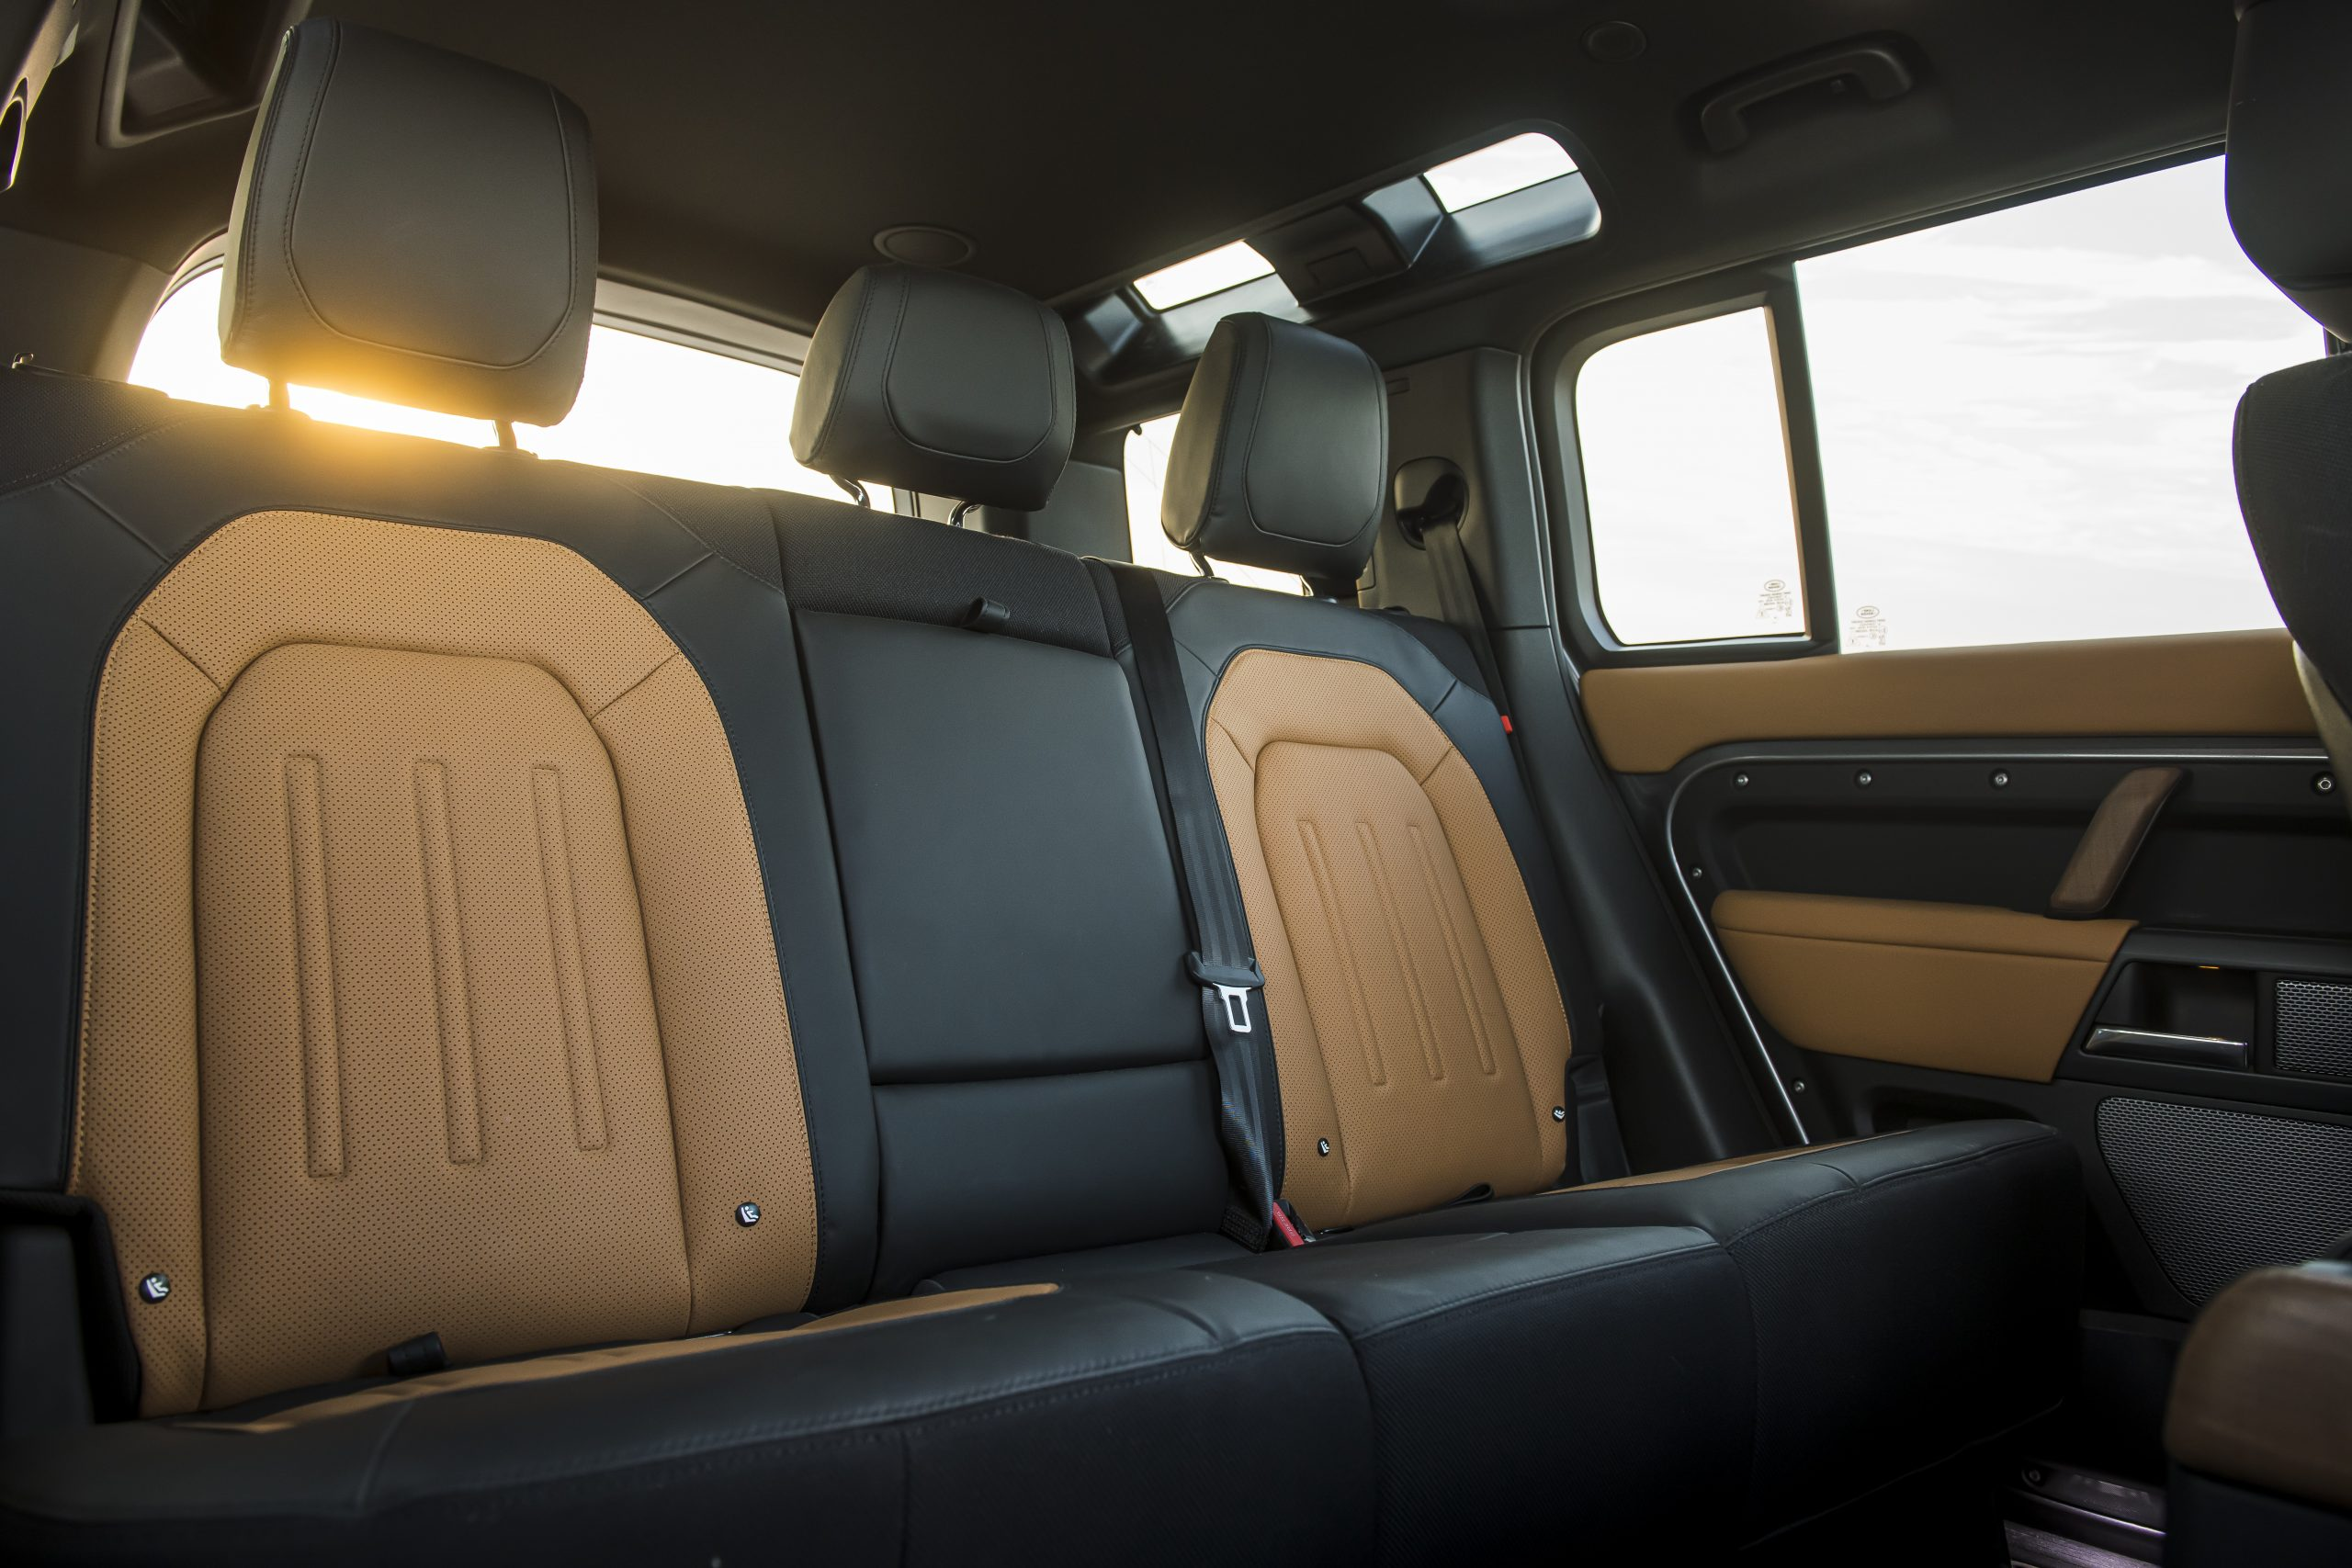 2020 Land Rover Defender rear seat